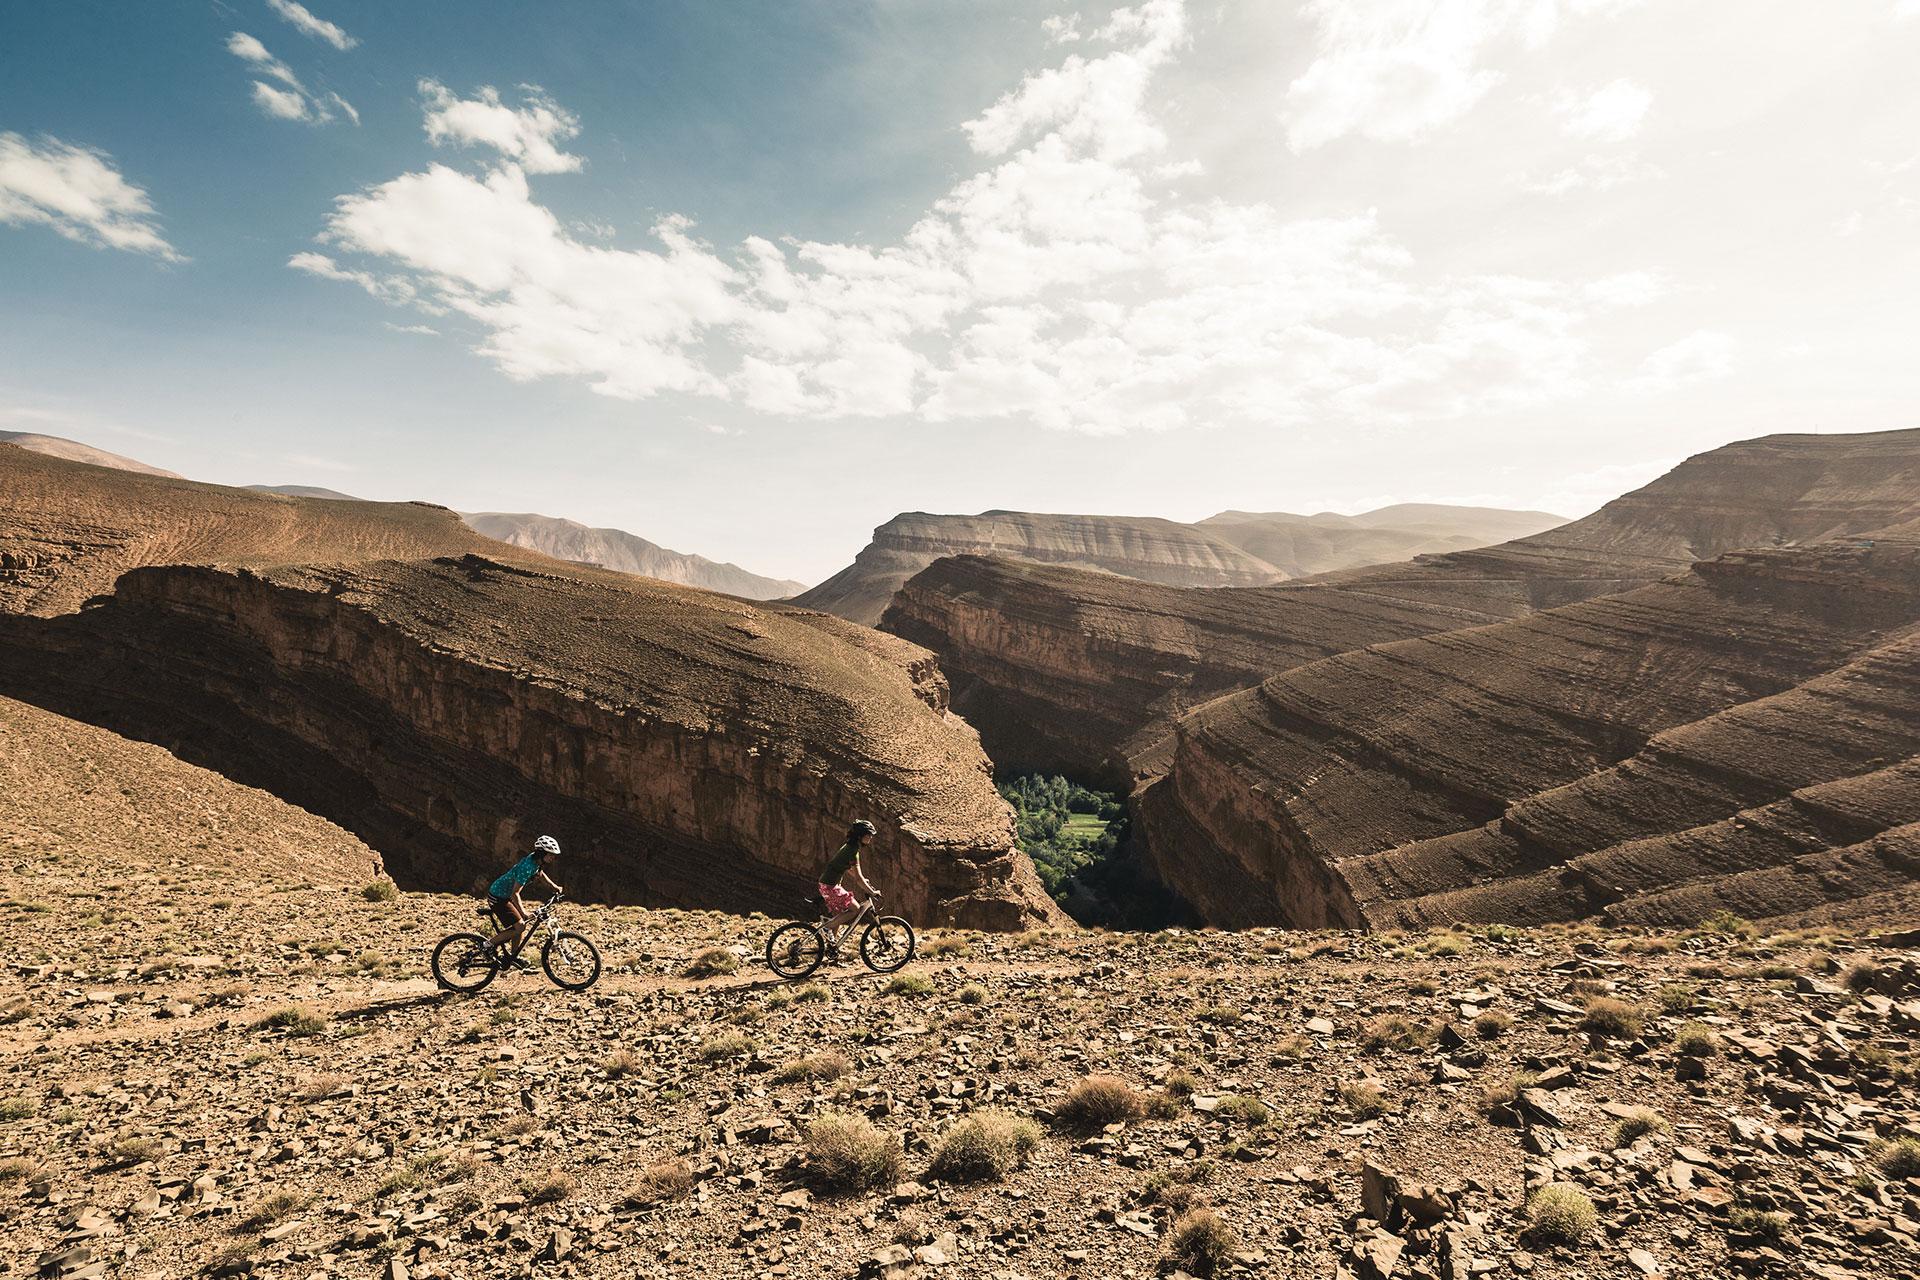 Mountainbike Landschaft Fotograf Marokko Katalogproduktion Hoher Dades Michael Müller